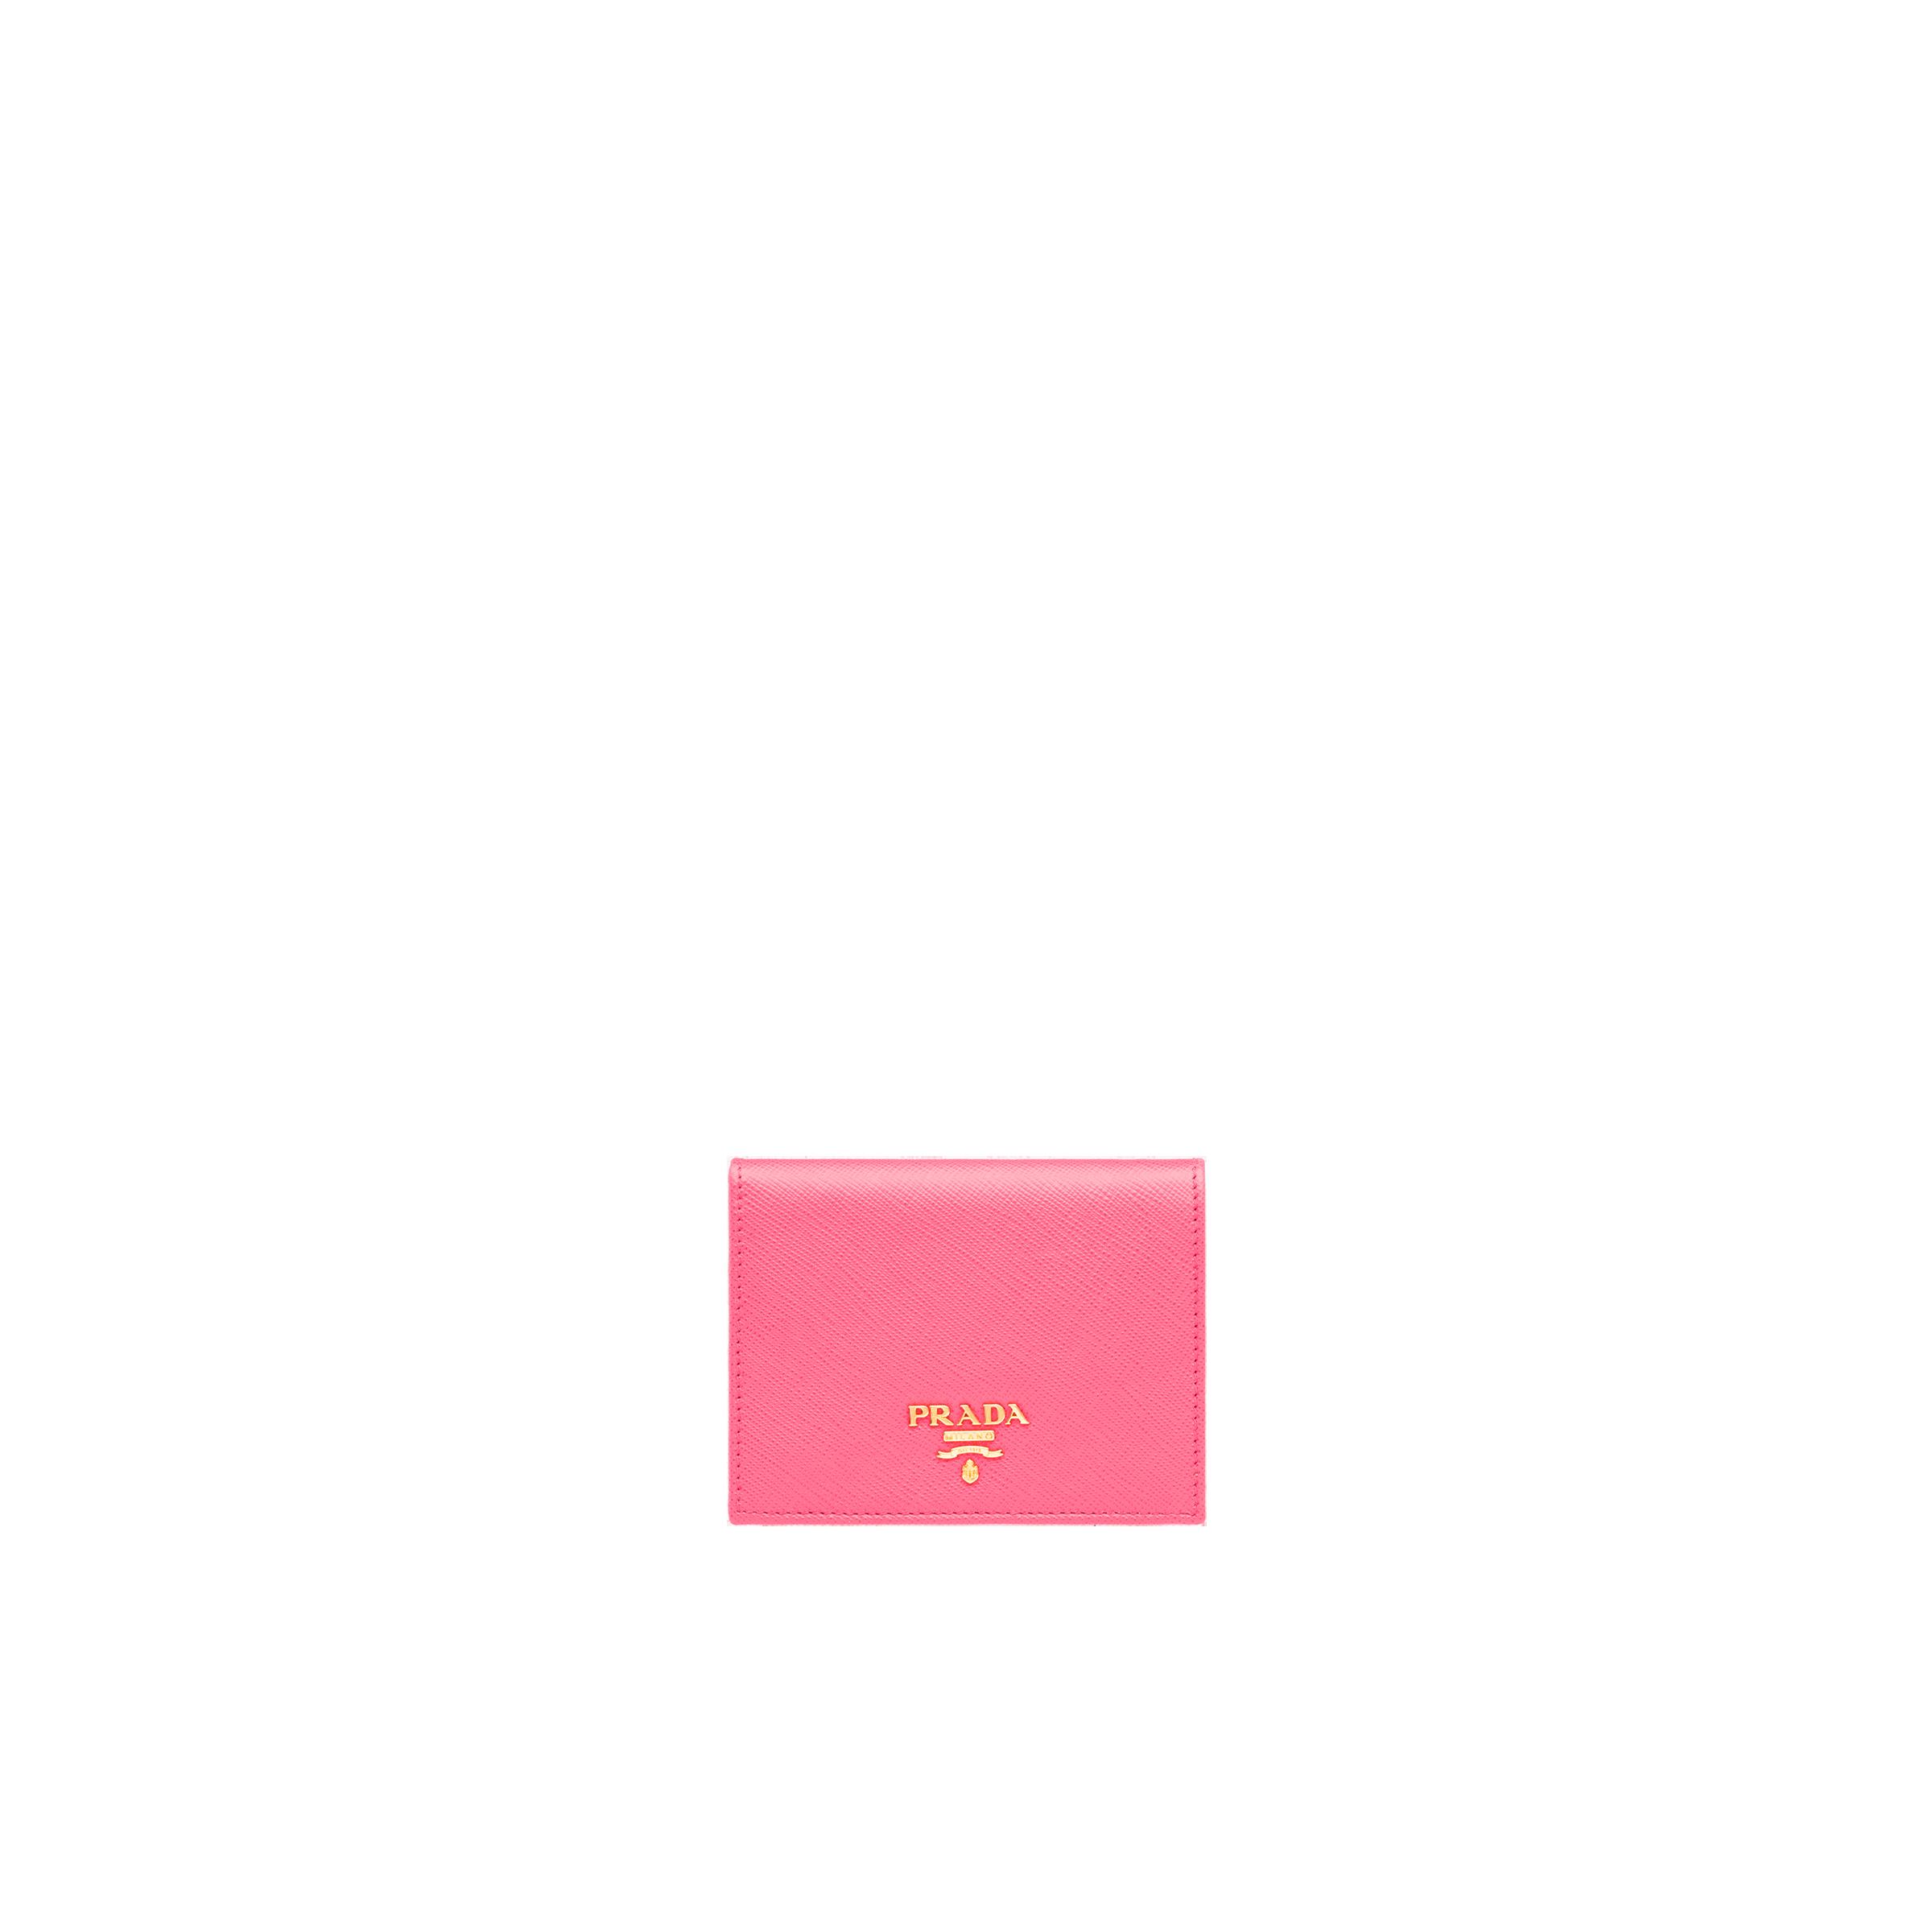 24b12f5d263d Women's Wallets | Prada